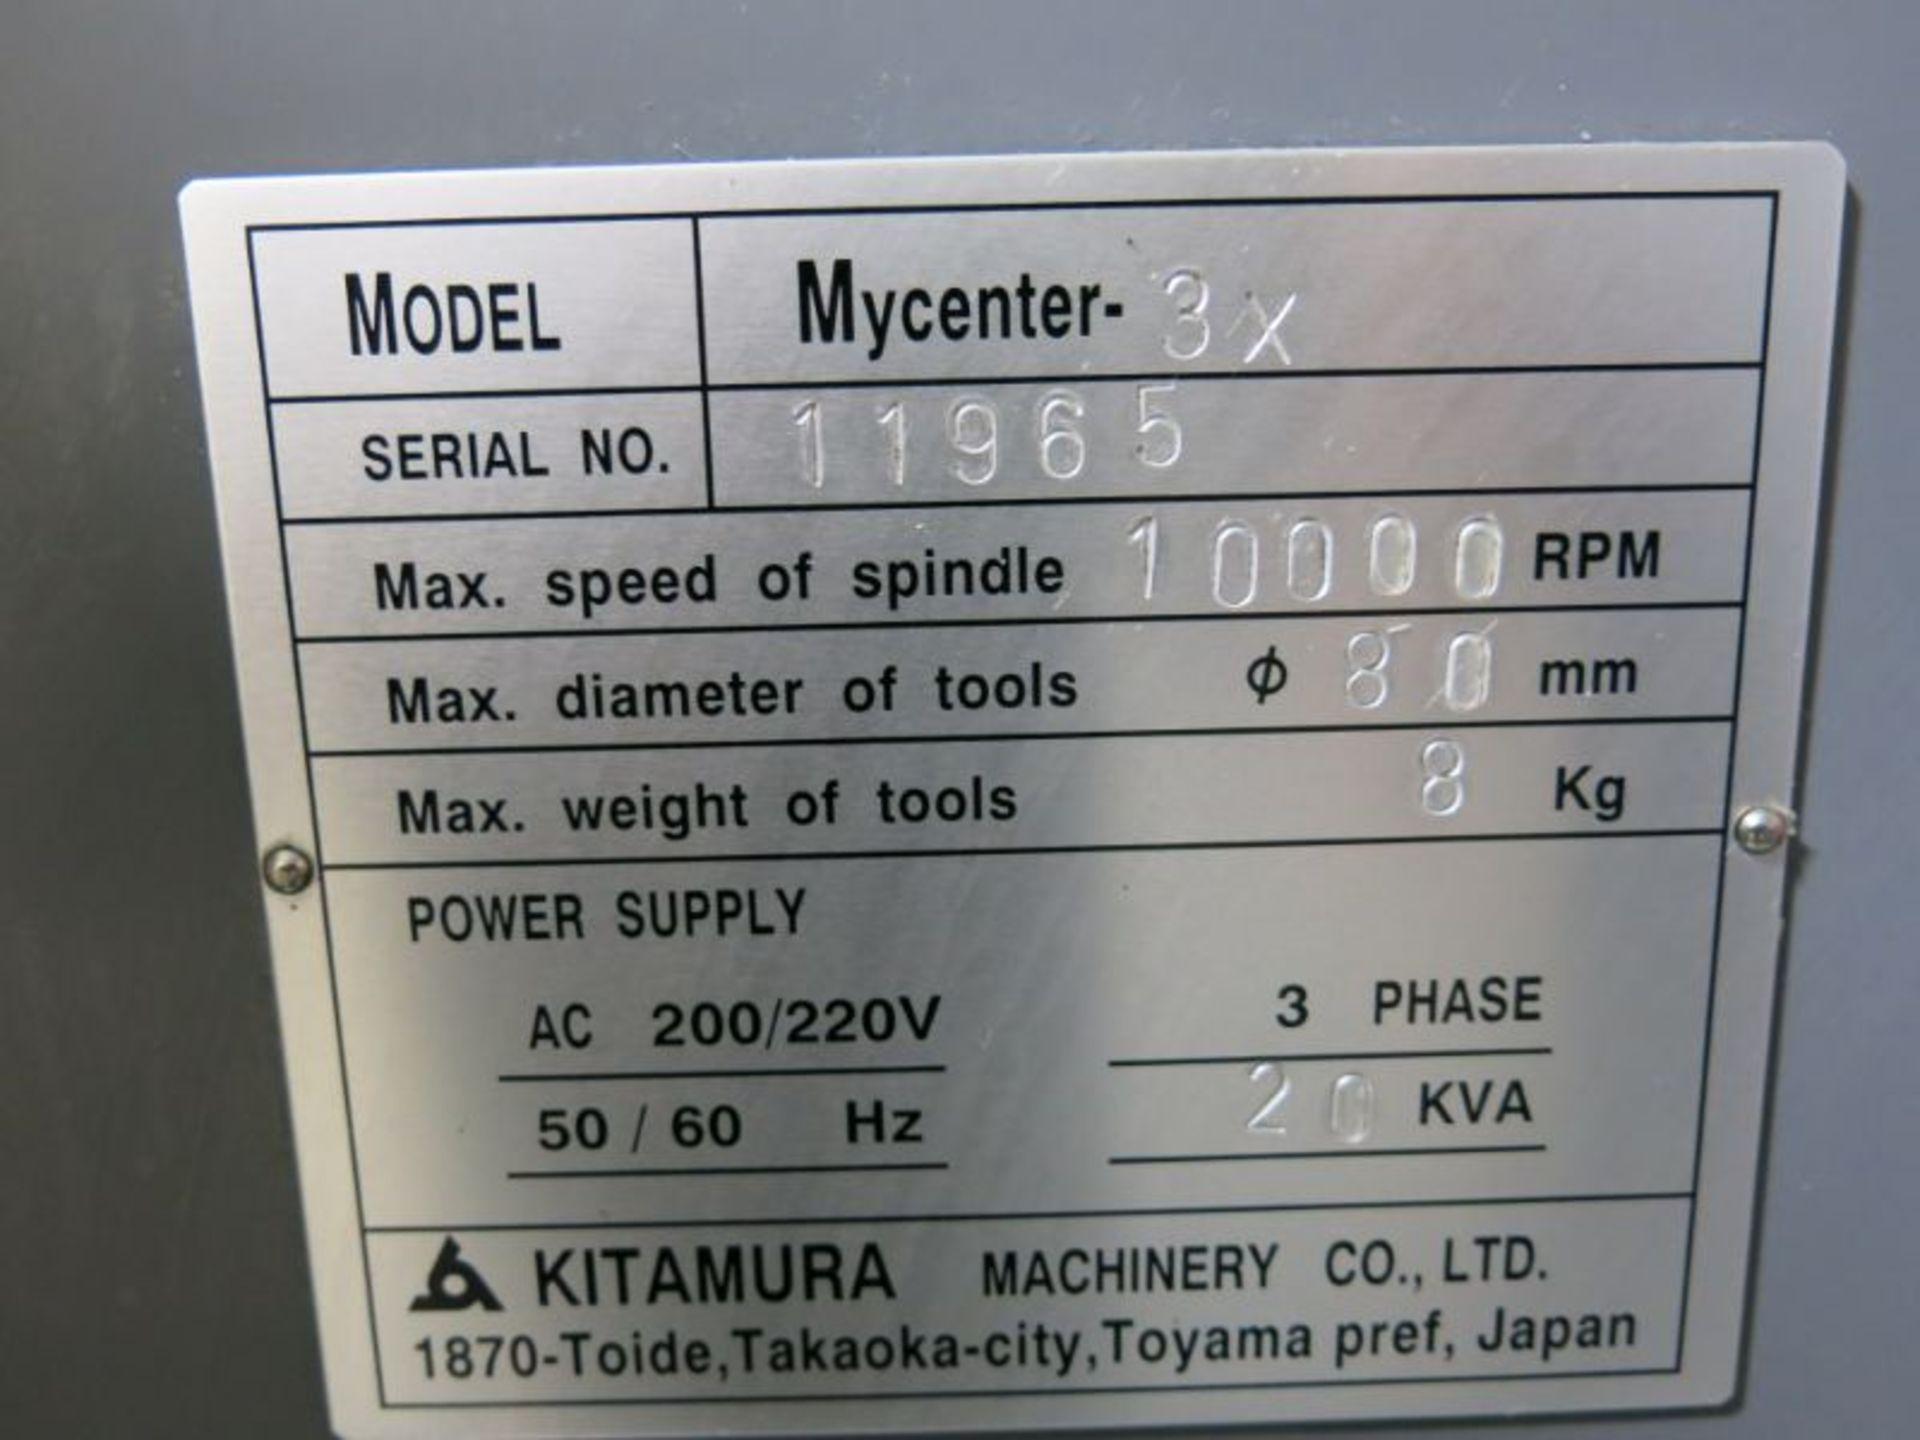 1998 Kitamura Mycenter 3X CNC VMC - Image 6 of 6